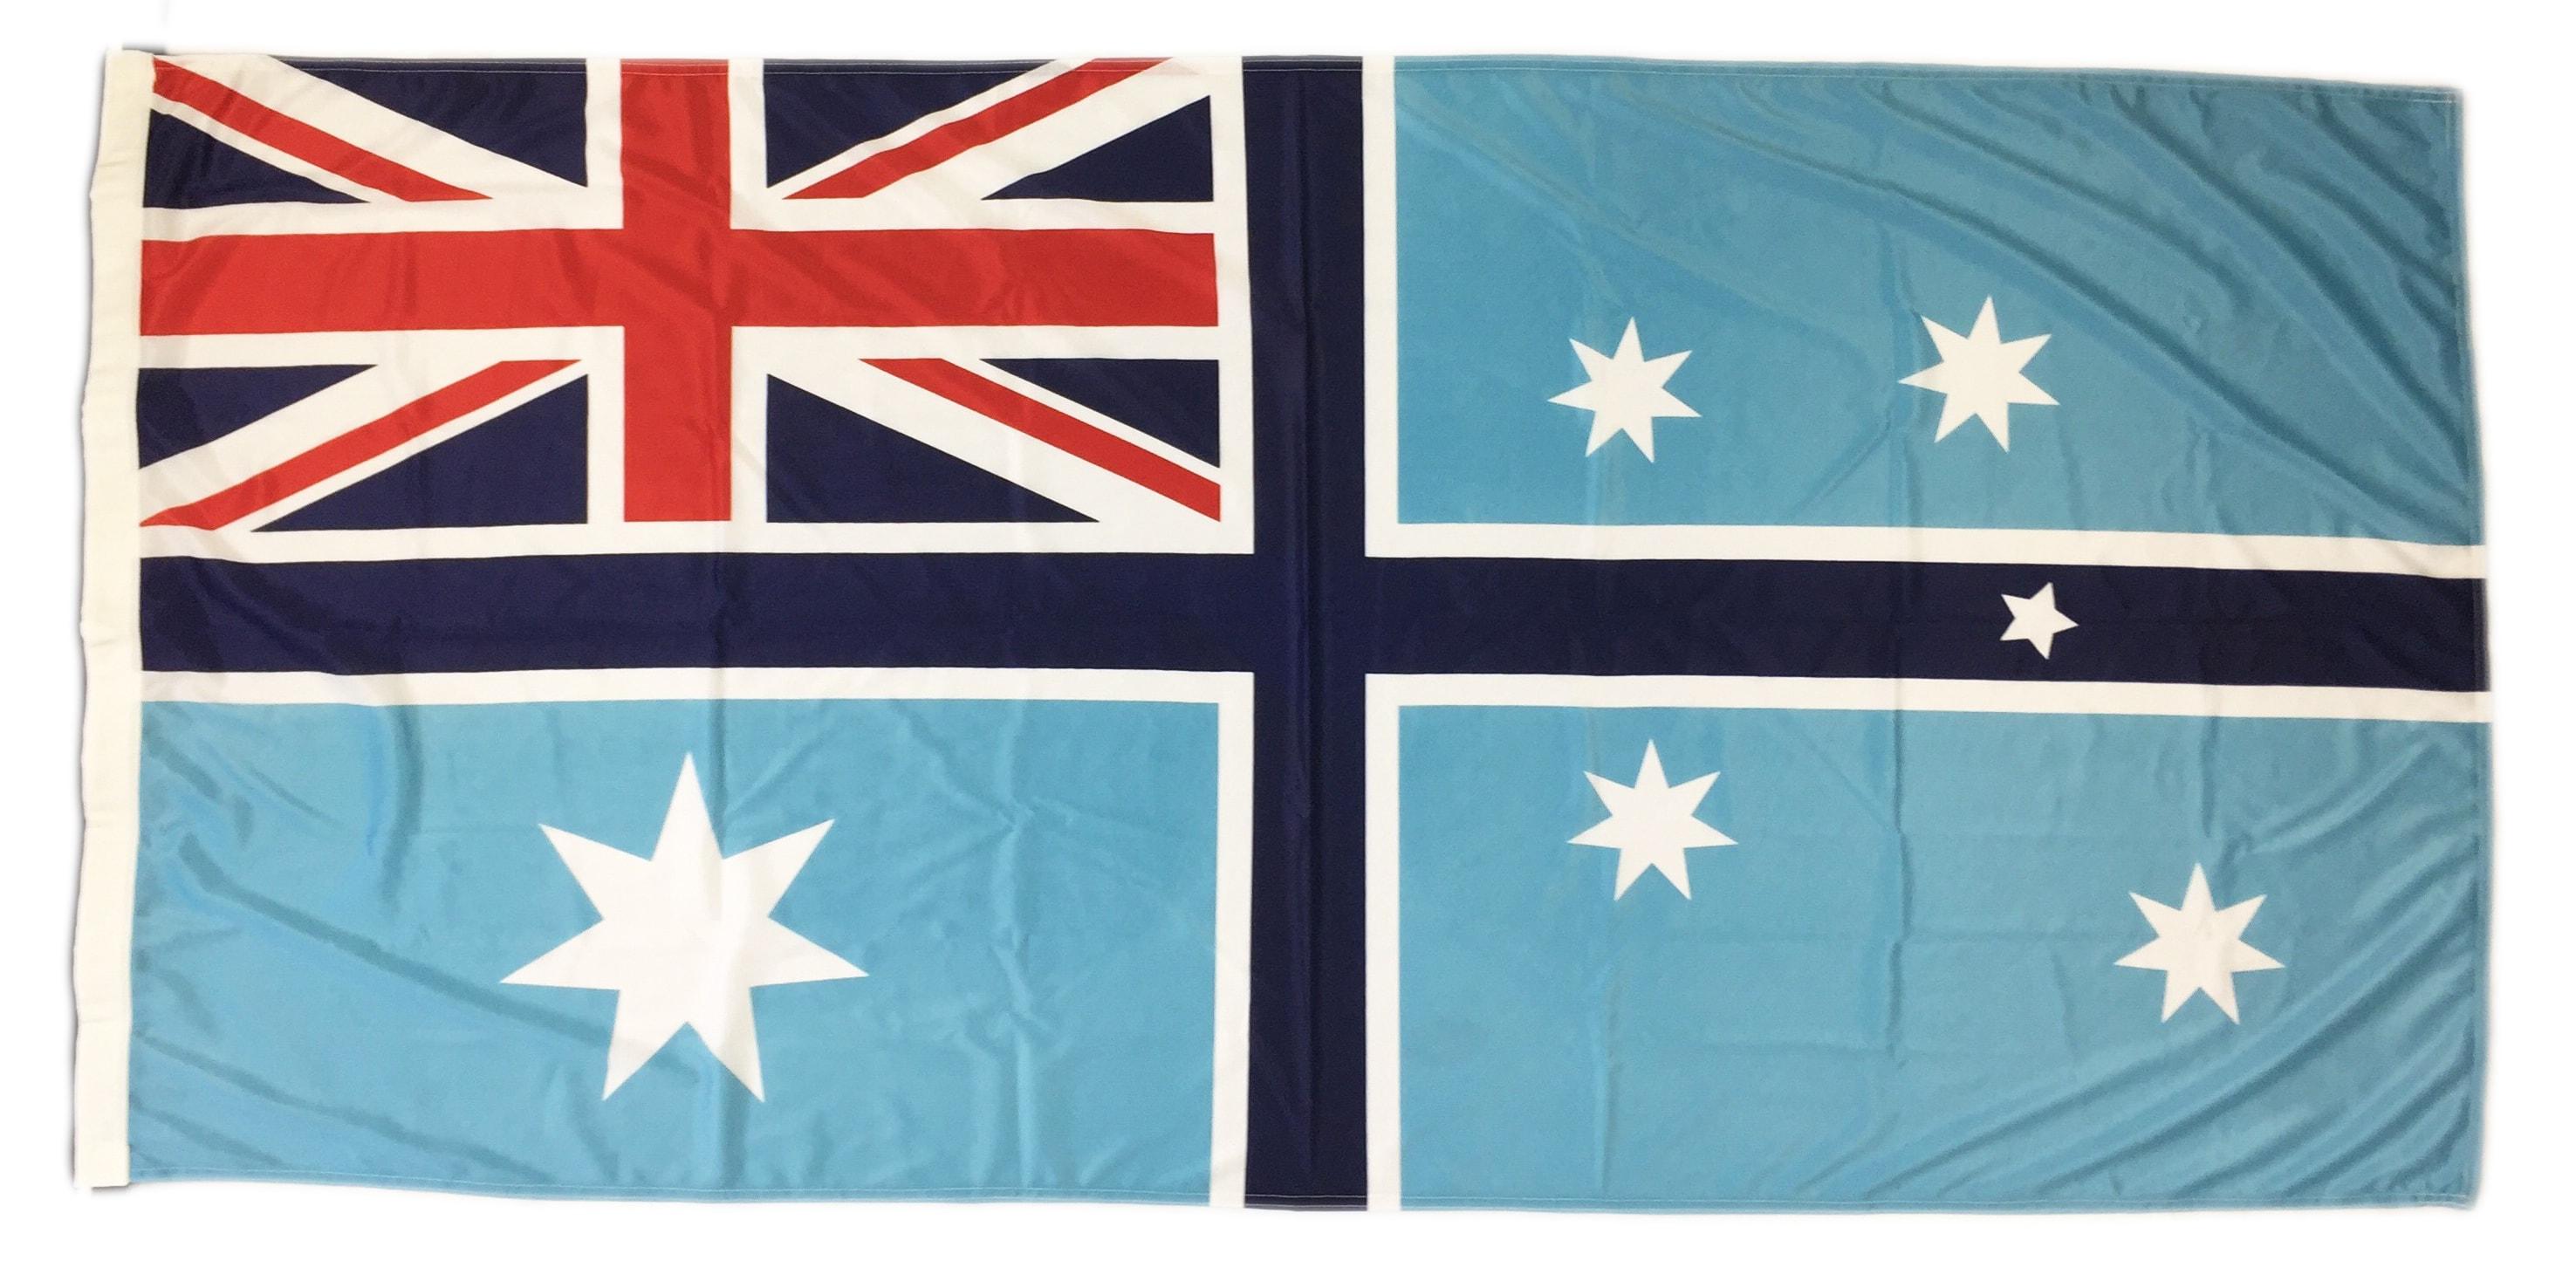 Other Australian Flags